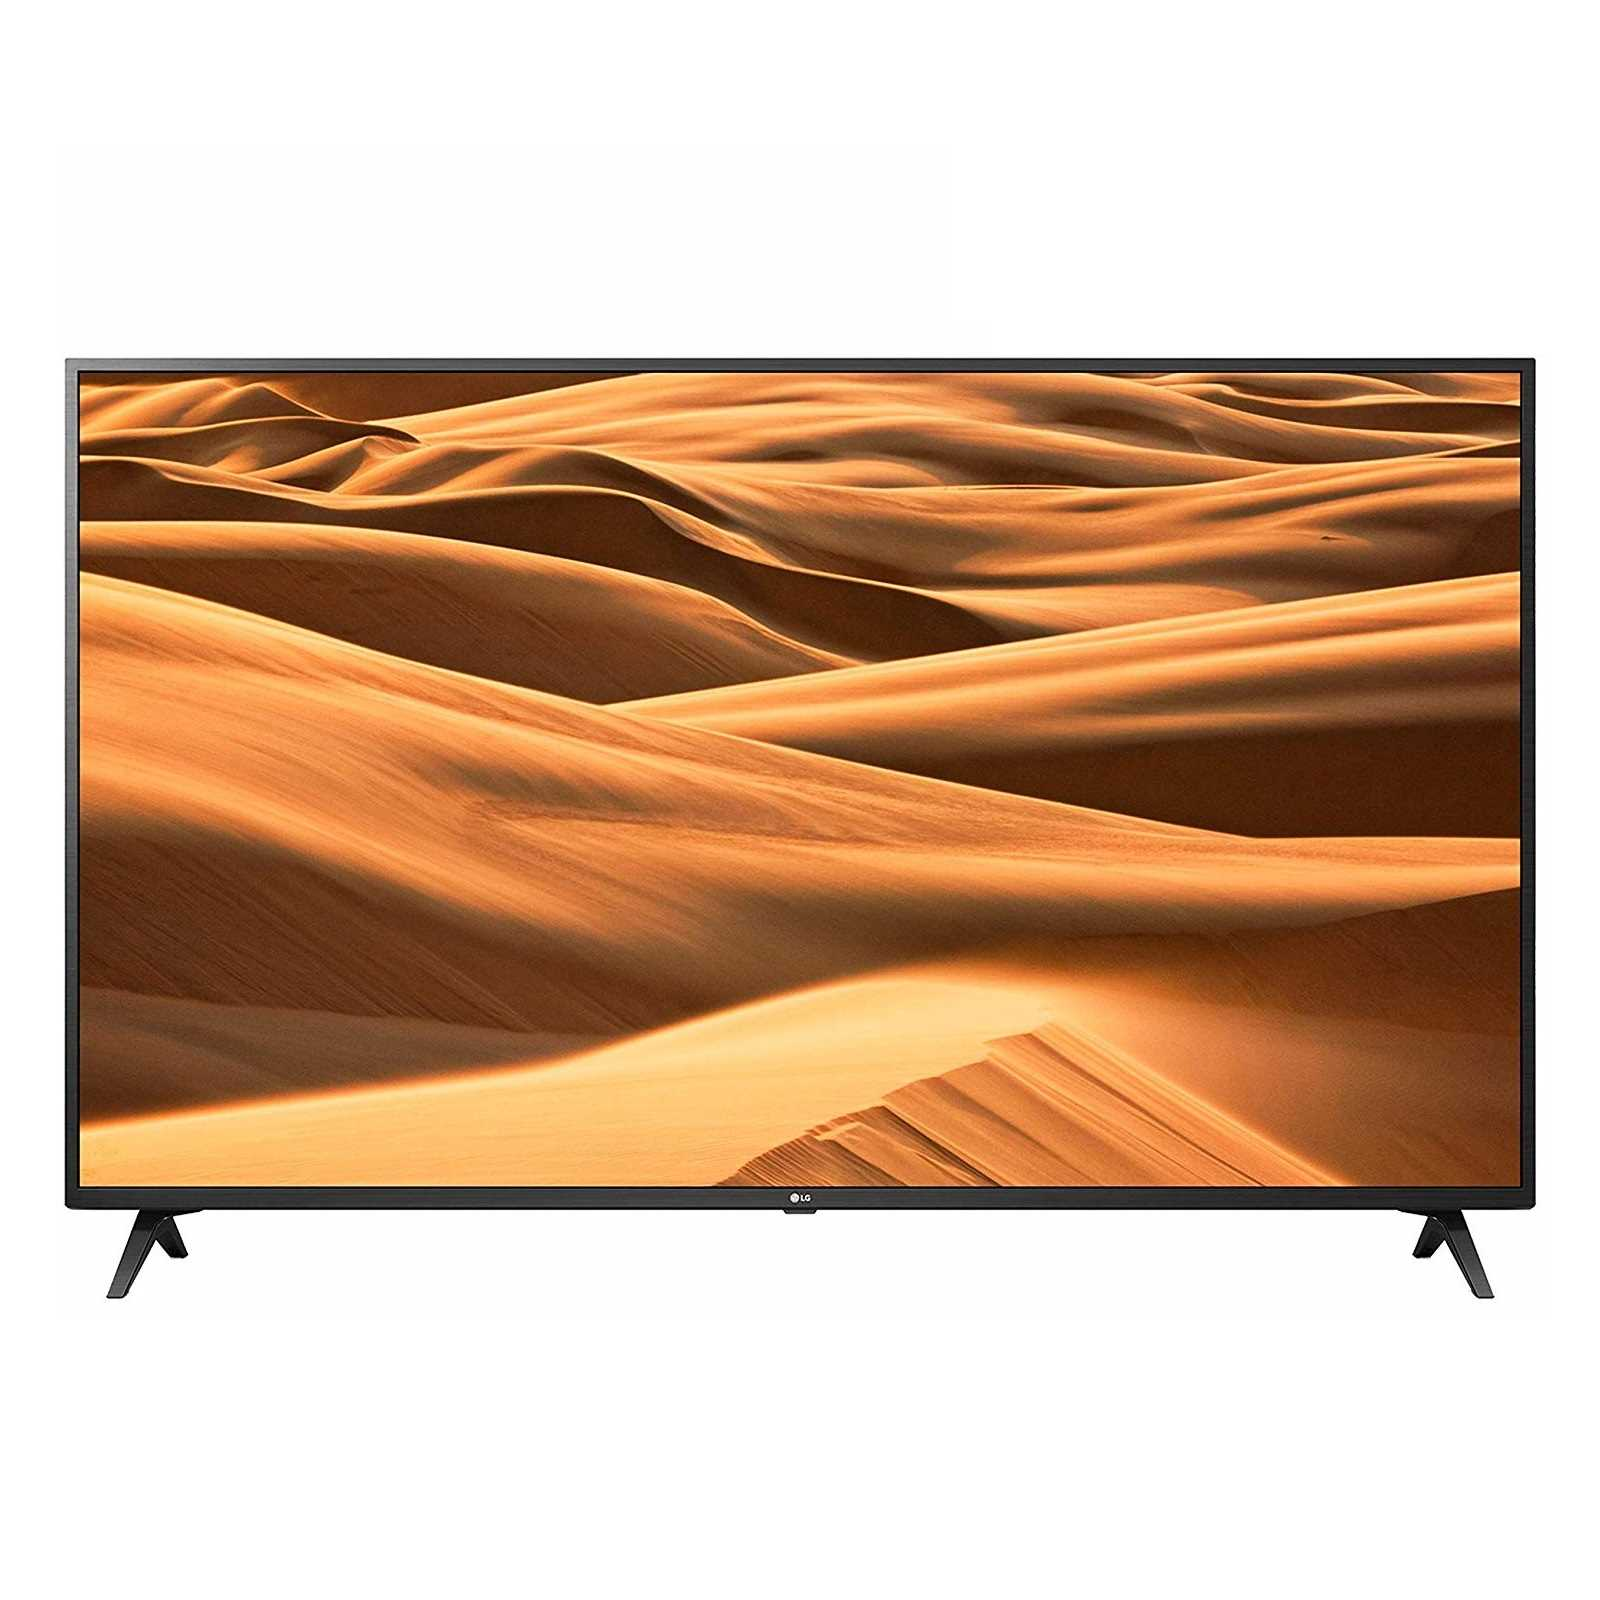 LG 55UM7290PTD 55 Inch 4K Ultra HD Smart LED Television